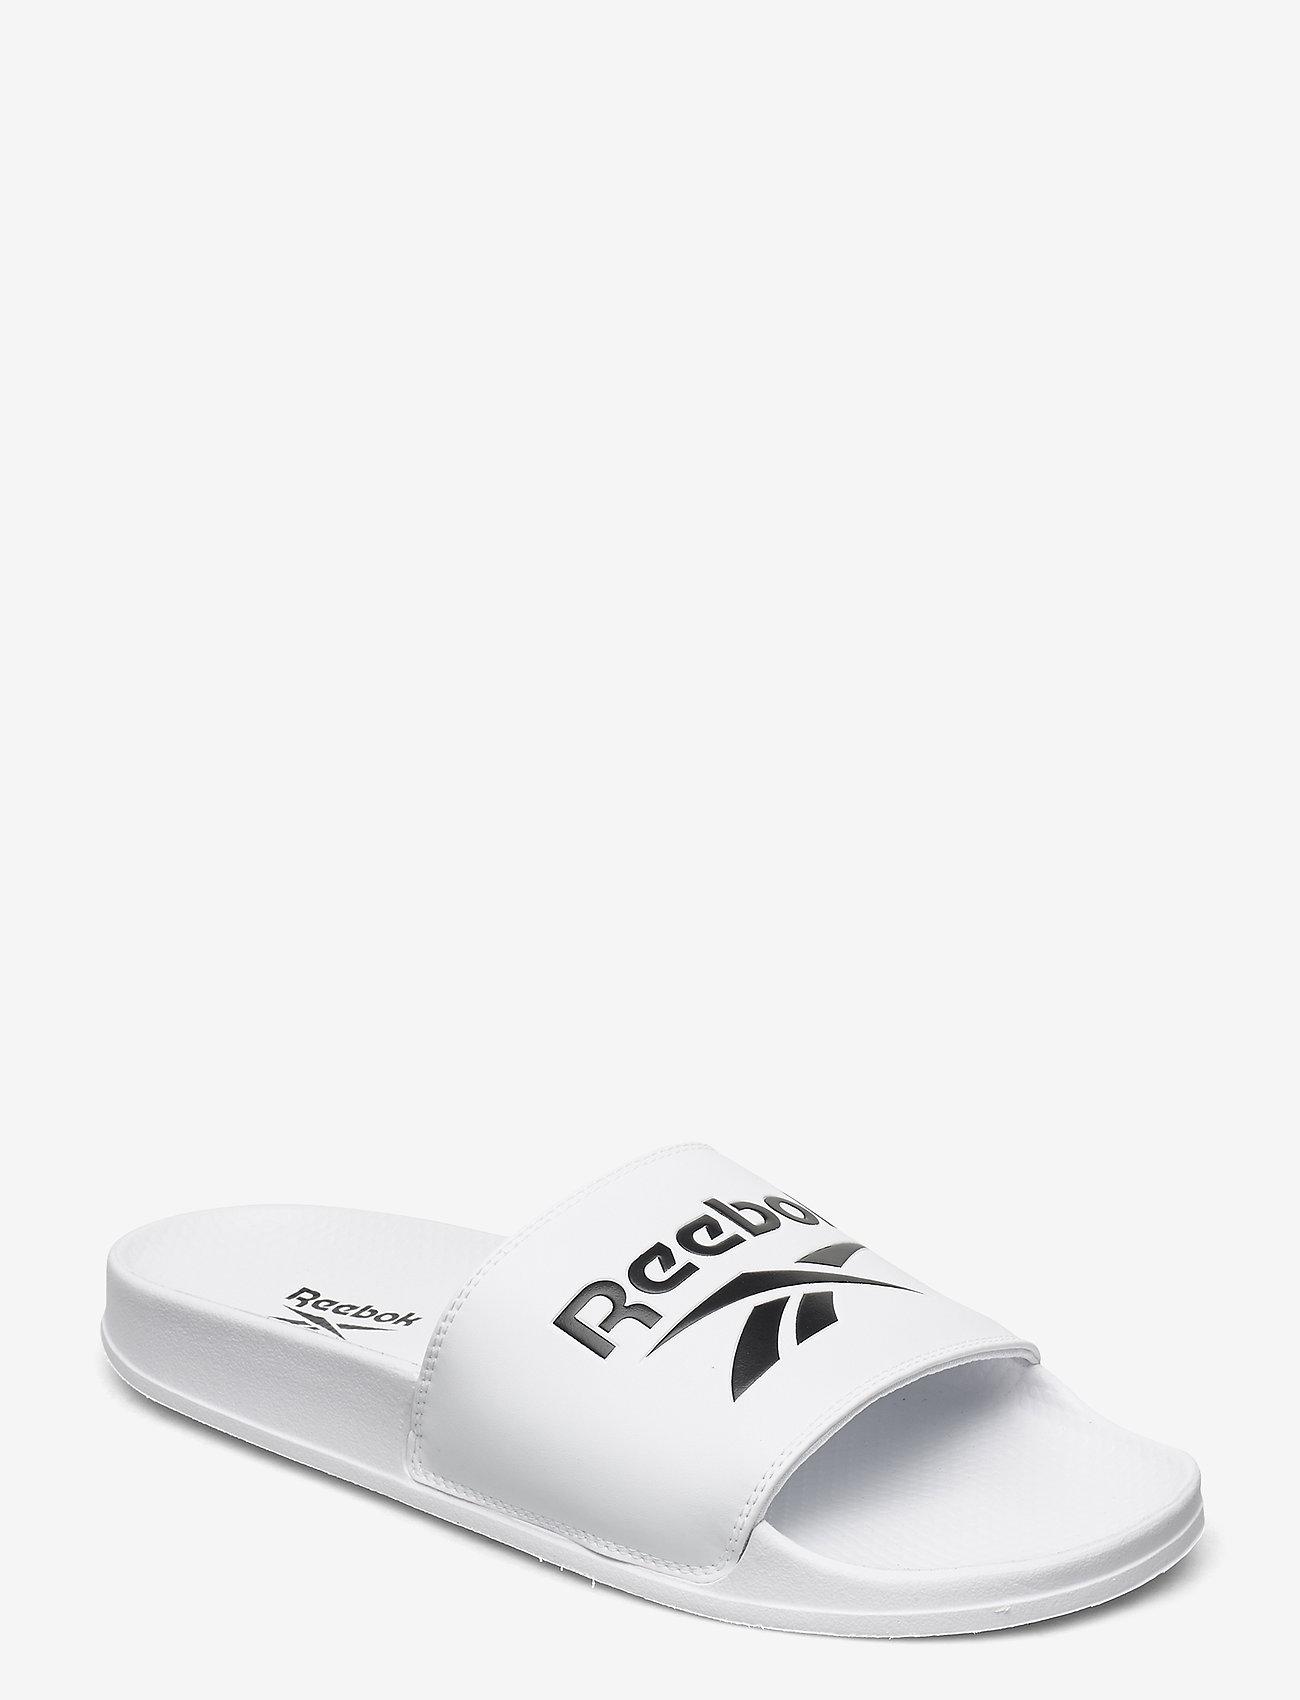 Reebok Classics - REEBOK CLASSIC SLIDE - sneakers - white/black/white - 0